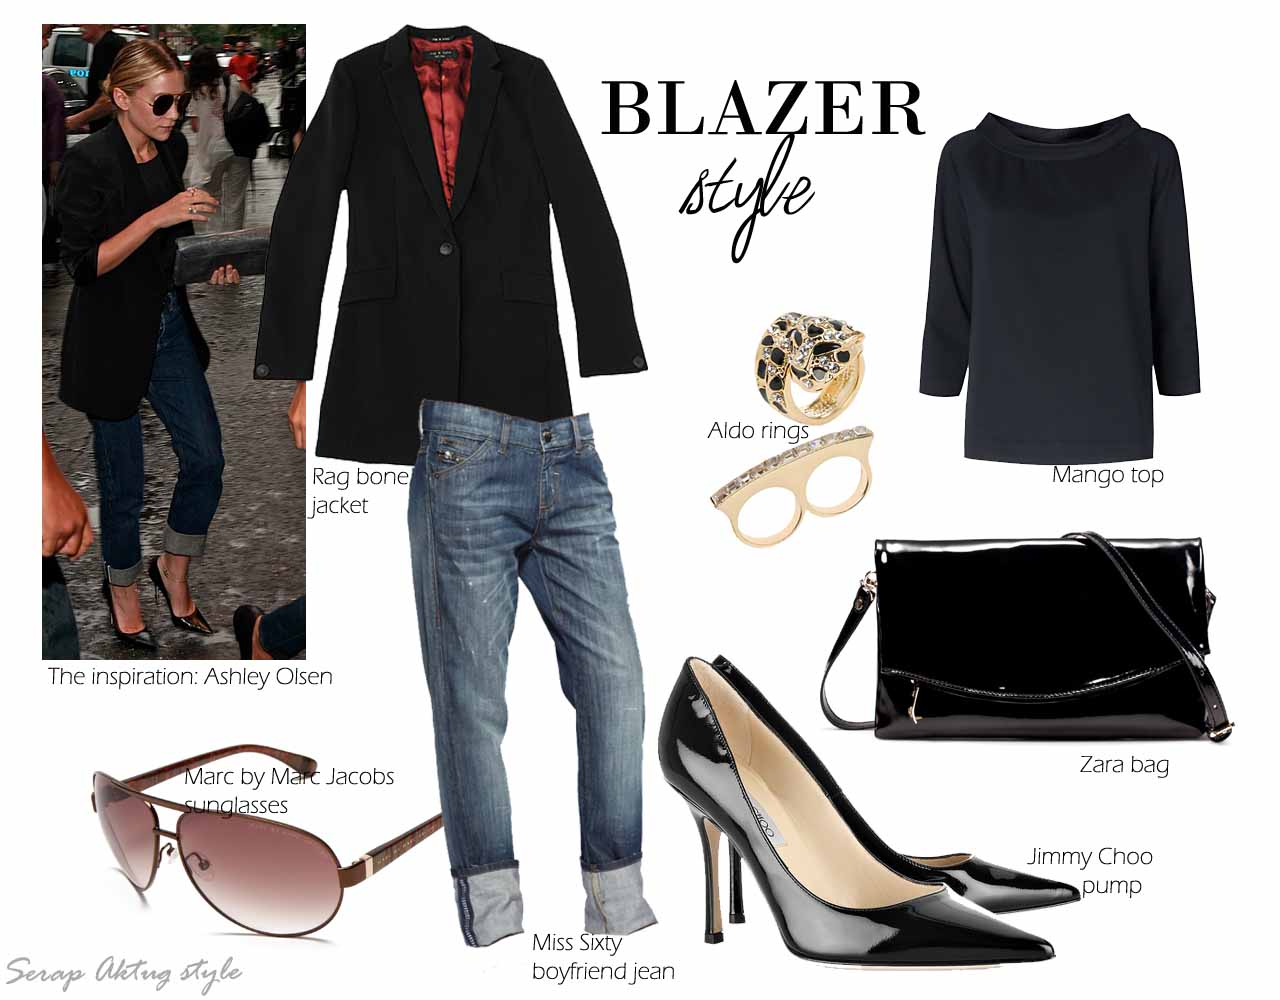 http://4.bp.blogspot.com/-gqBTrUB0C6M/Tp30vElCzRI/AAAAAAAADsA/eFUhyZIQIRg/s1600/the+blazer.jpg